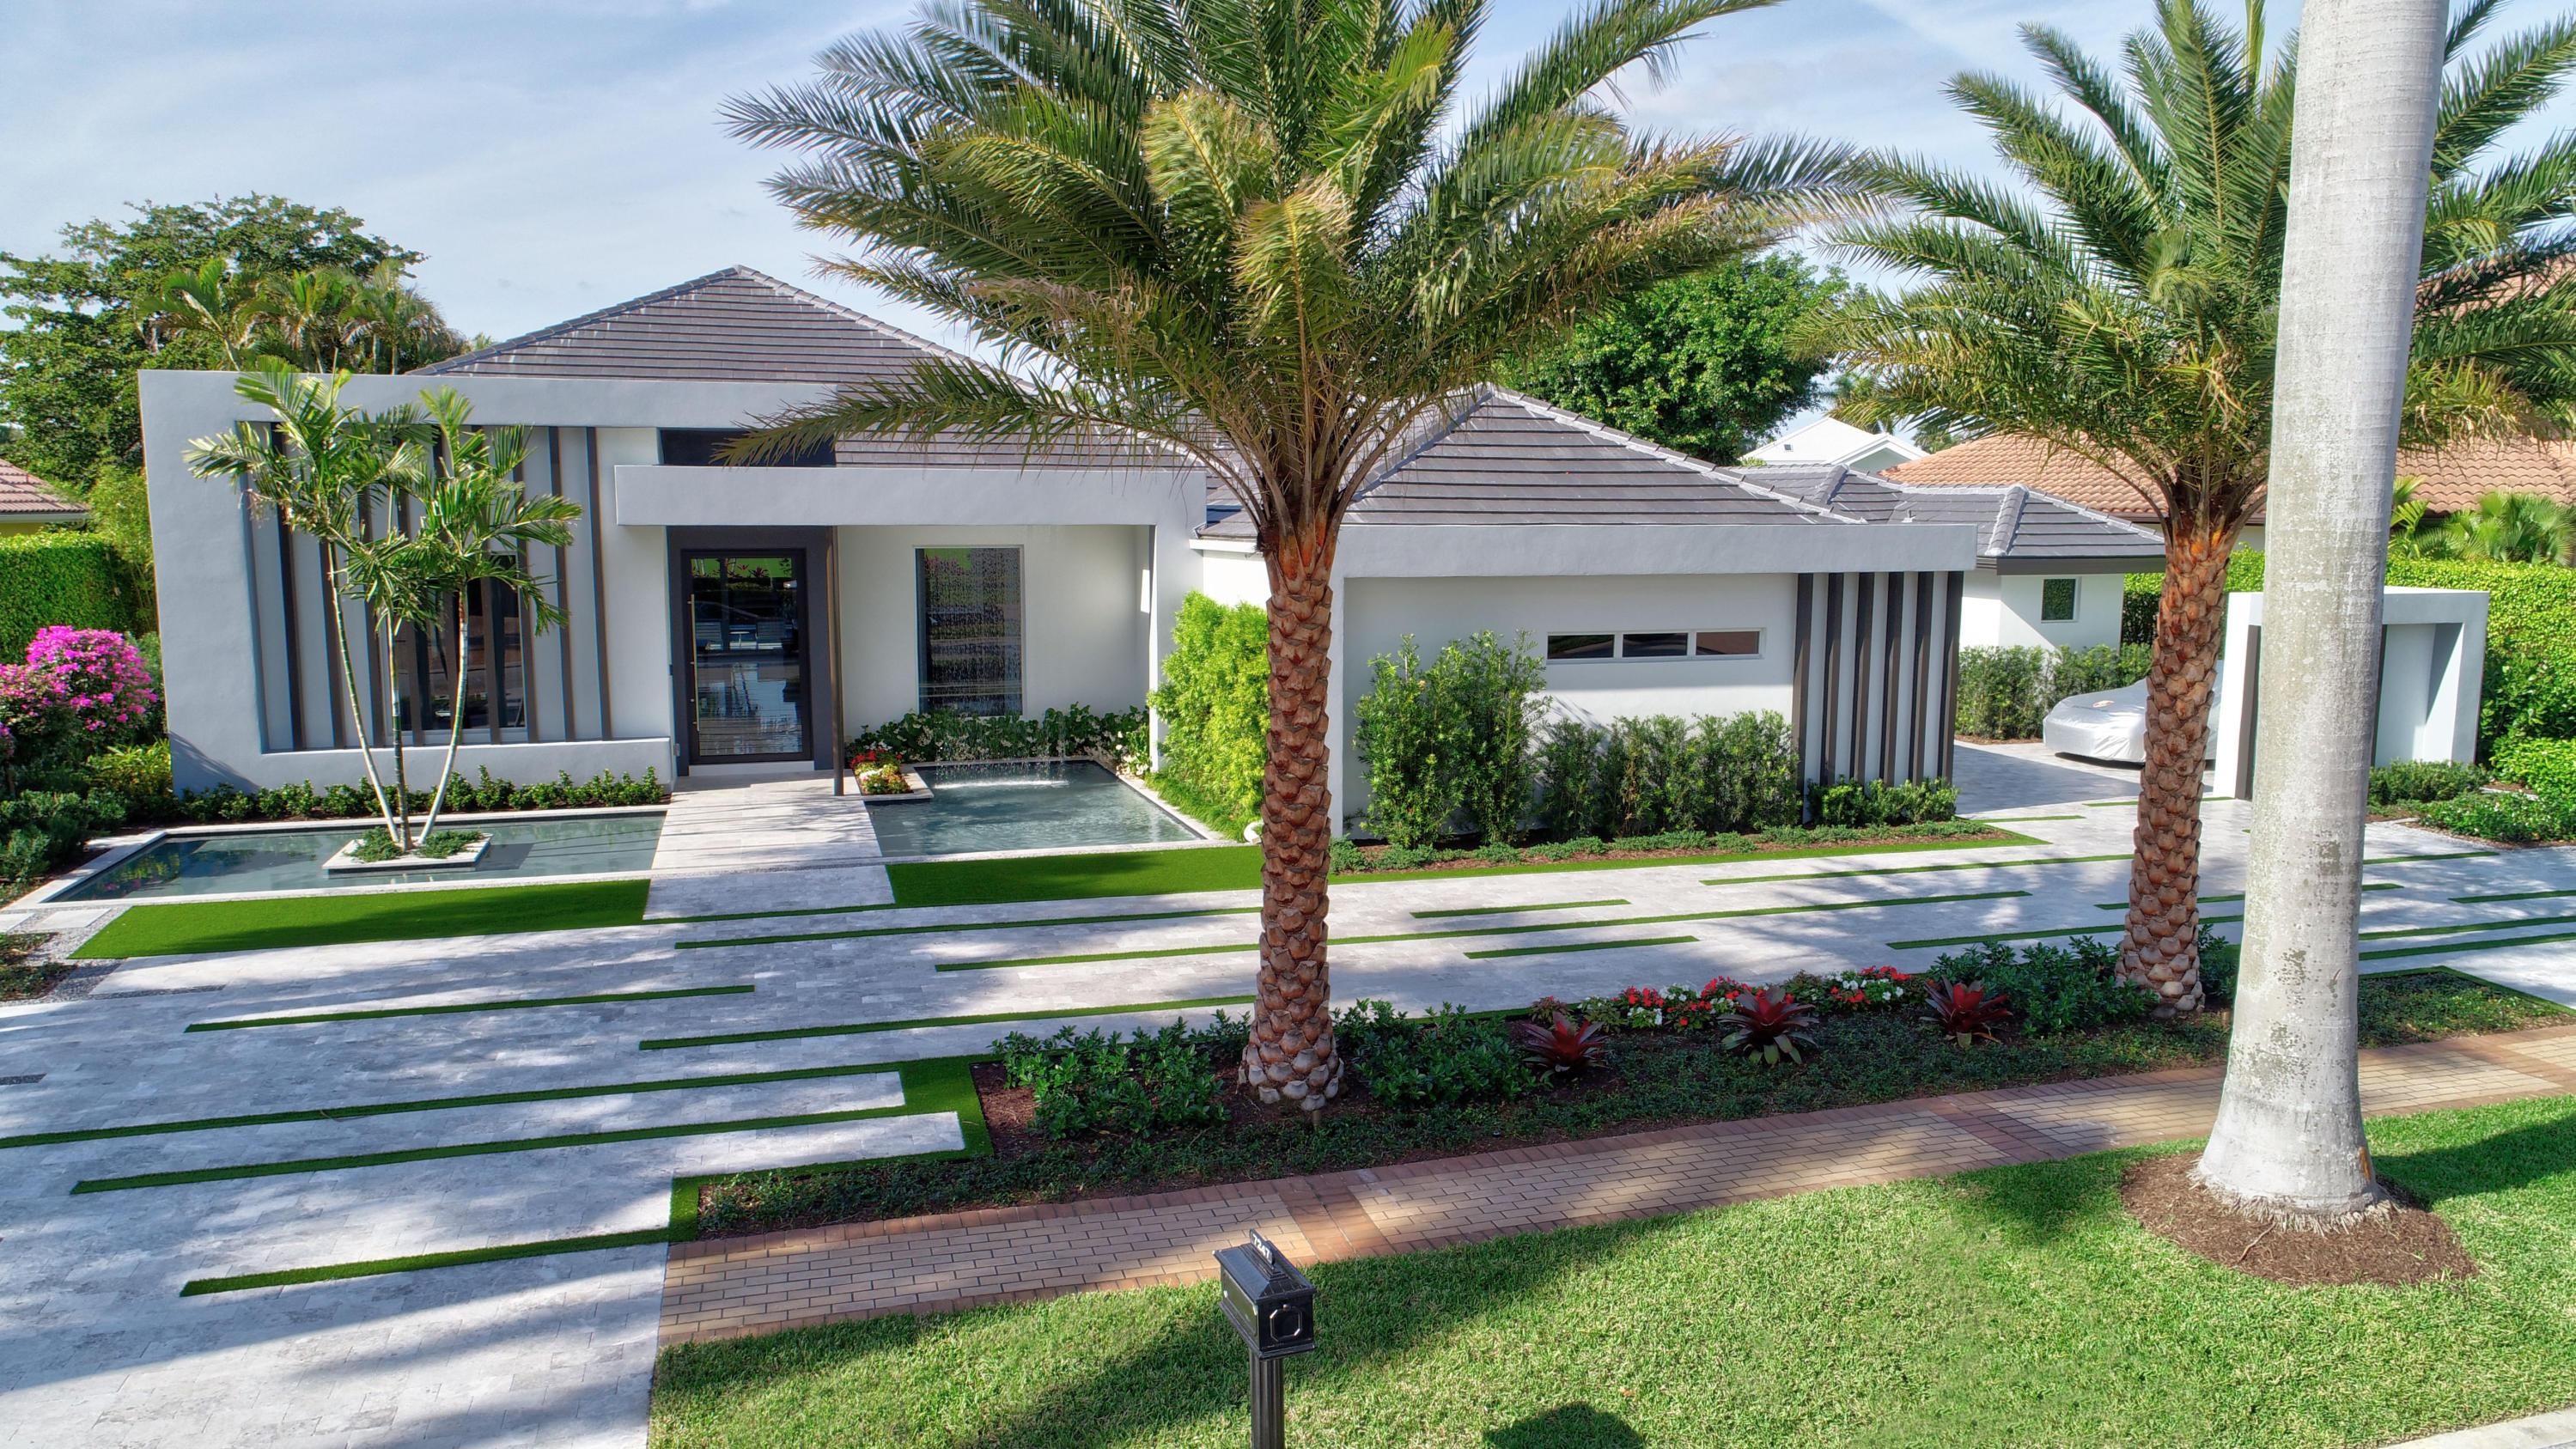 Photo of 7247 Ballantrae Court, Boca Raton, FL 33496